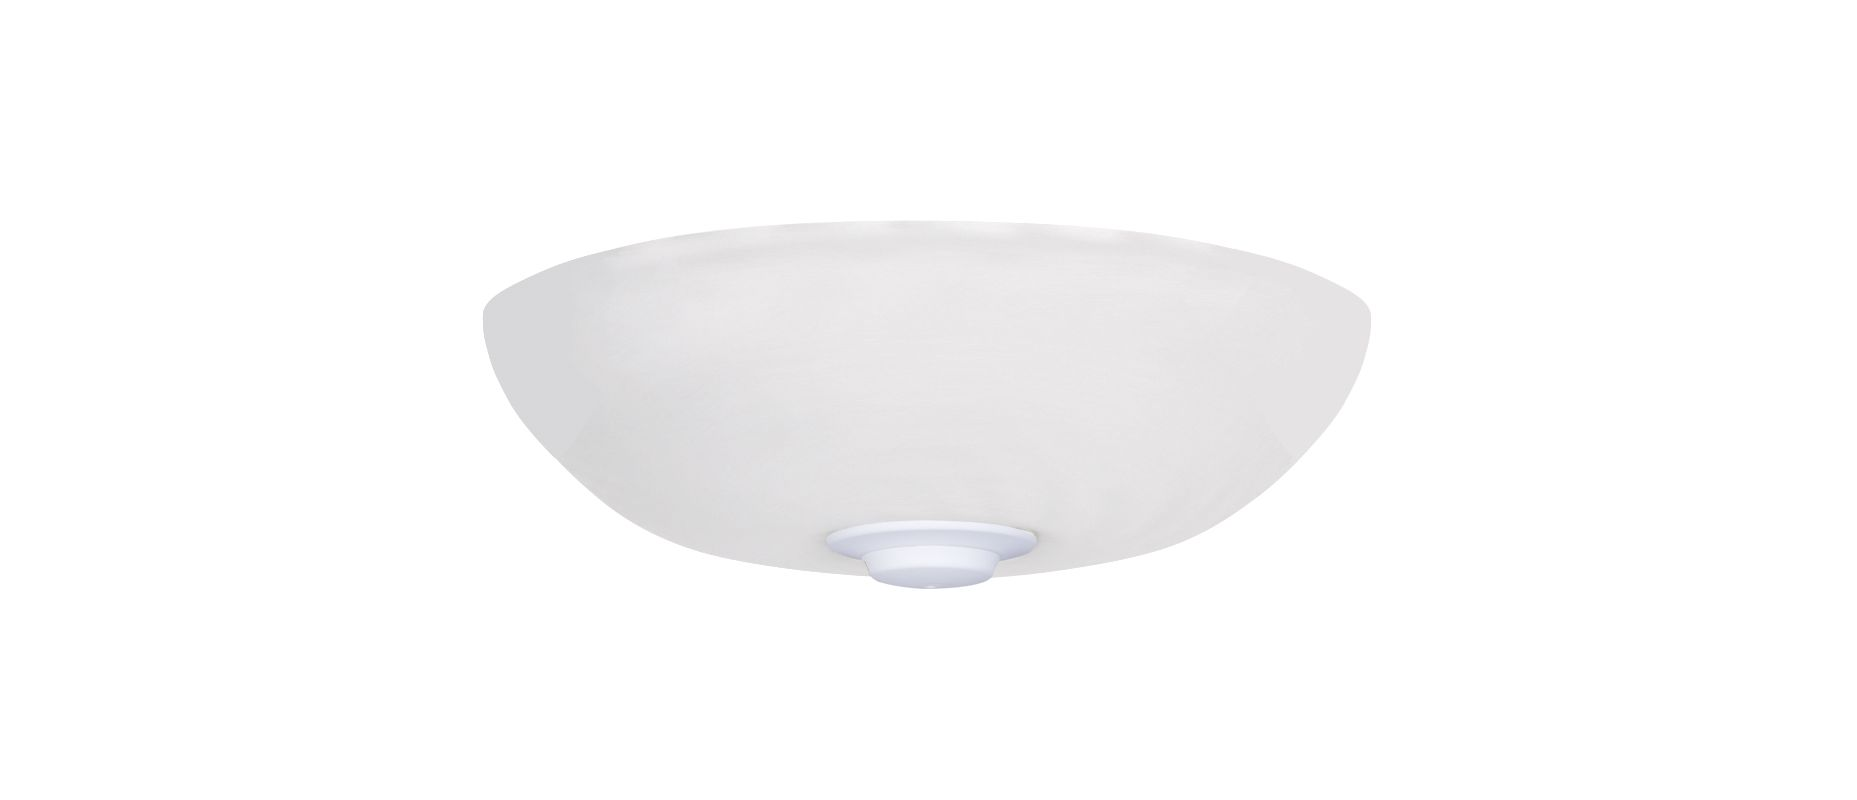 Led Ceiling Lights Usa : Led ceiling fan usa page